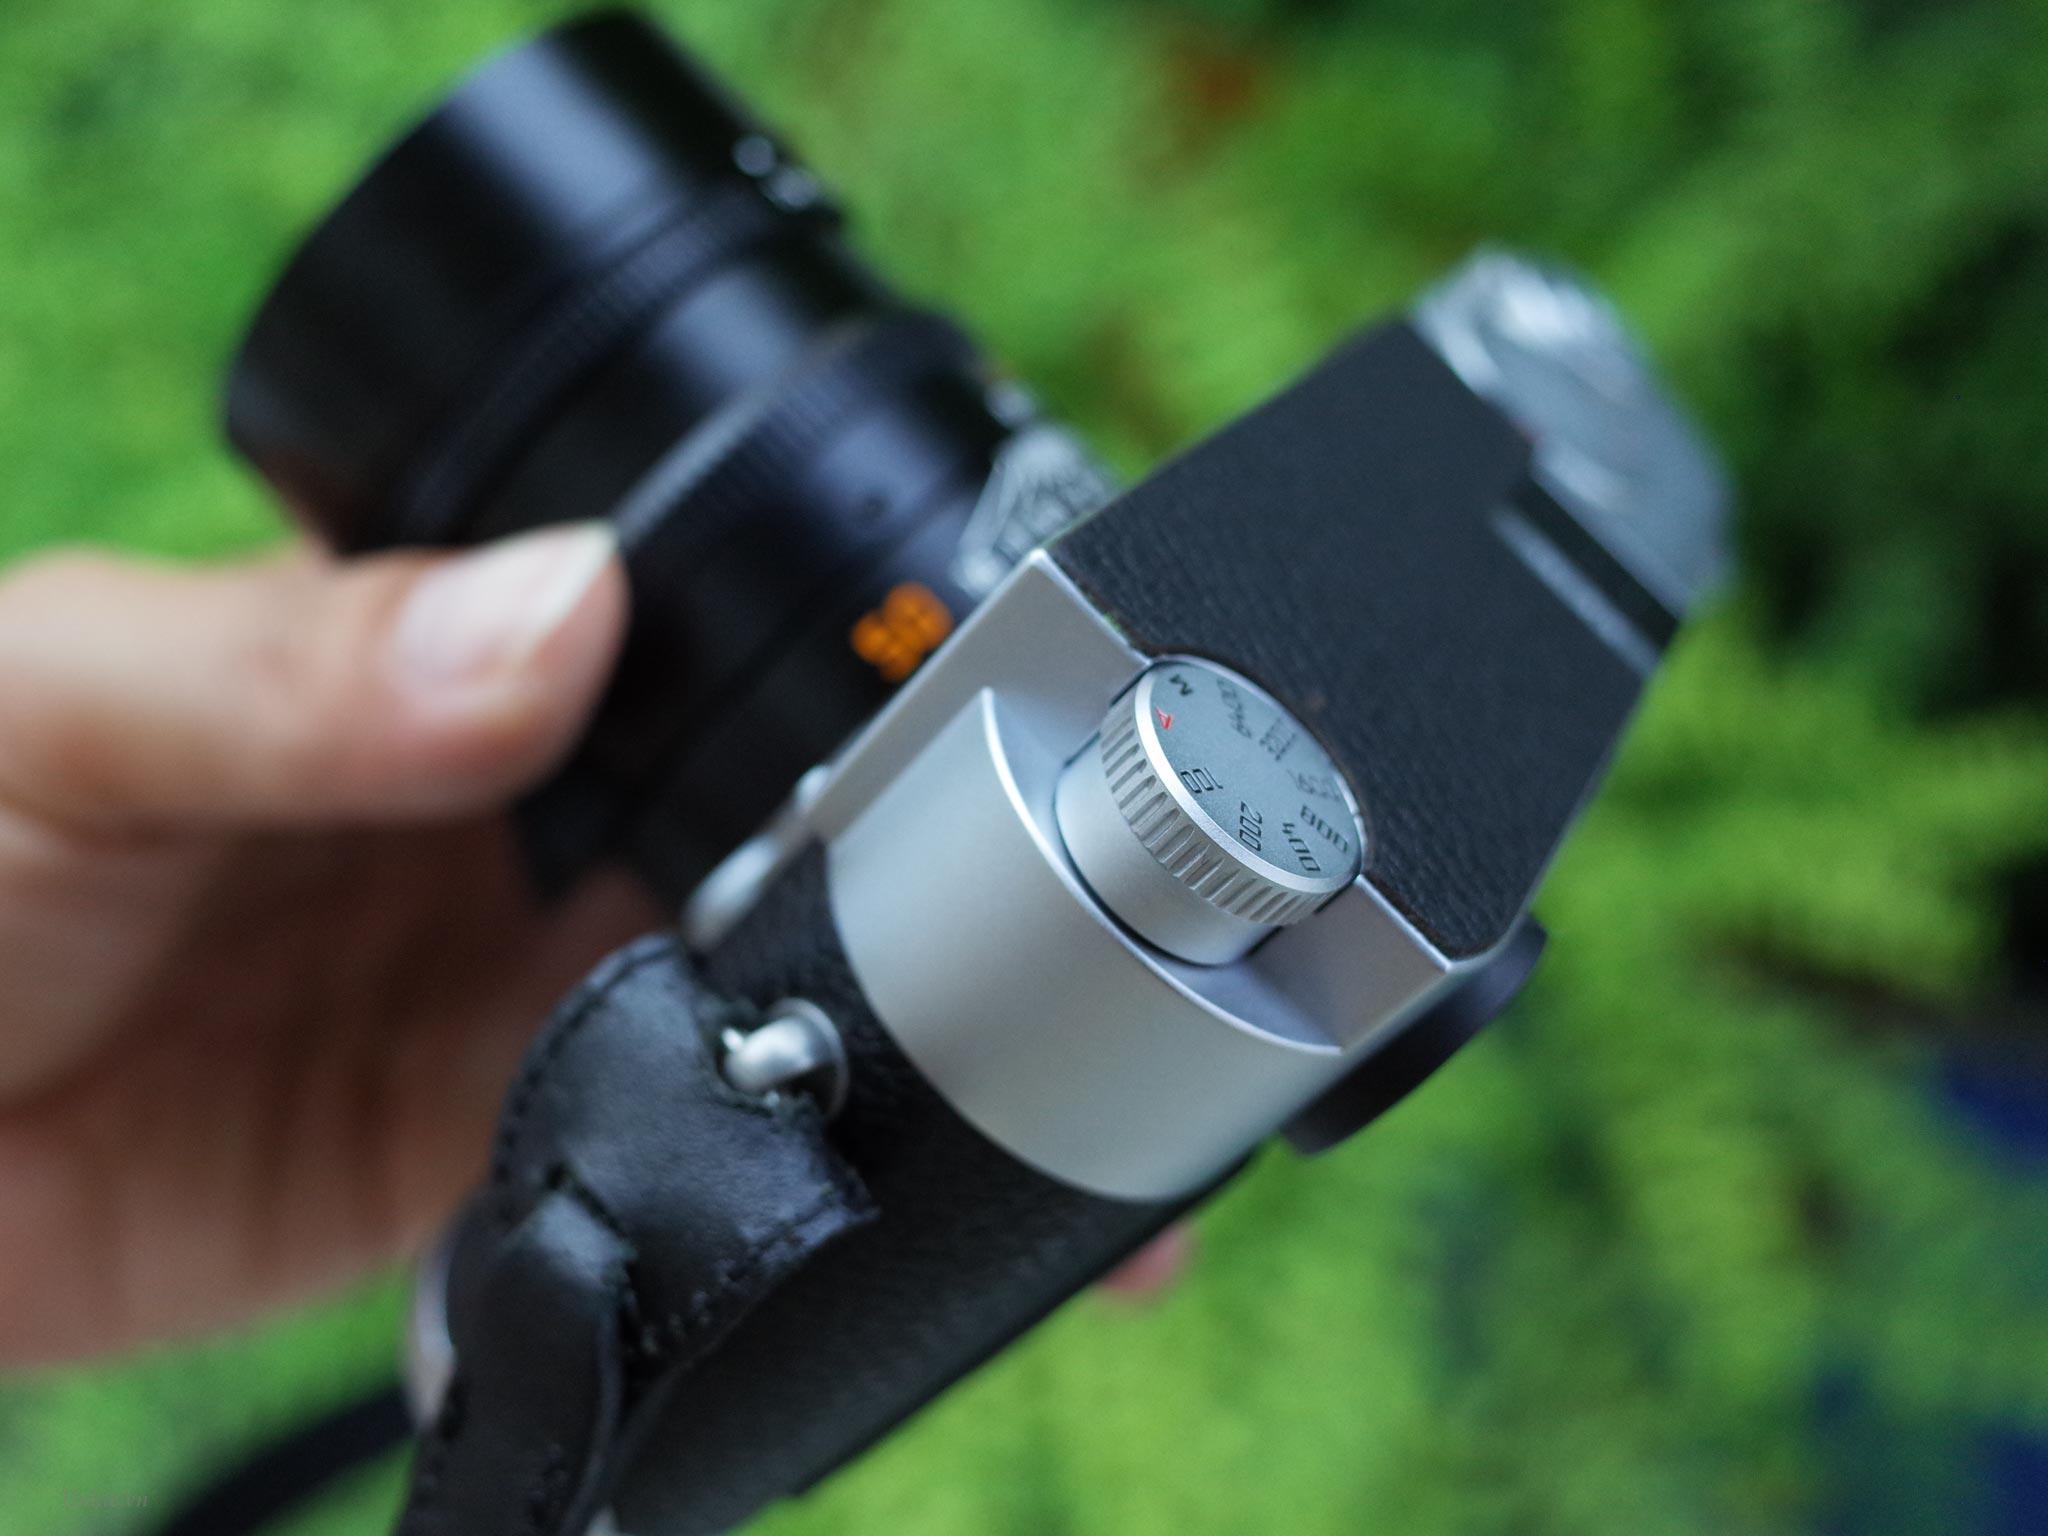 Leica_M10_Louis_Wu_camera.tinhte.vn_02.jpg